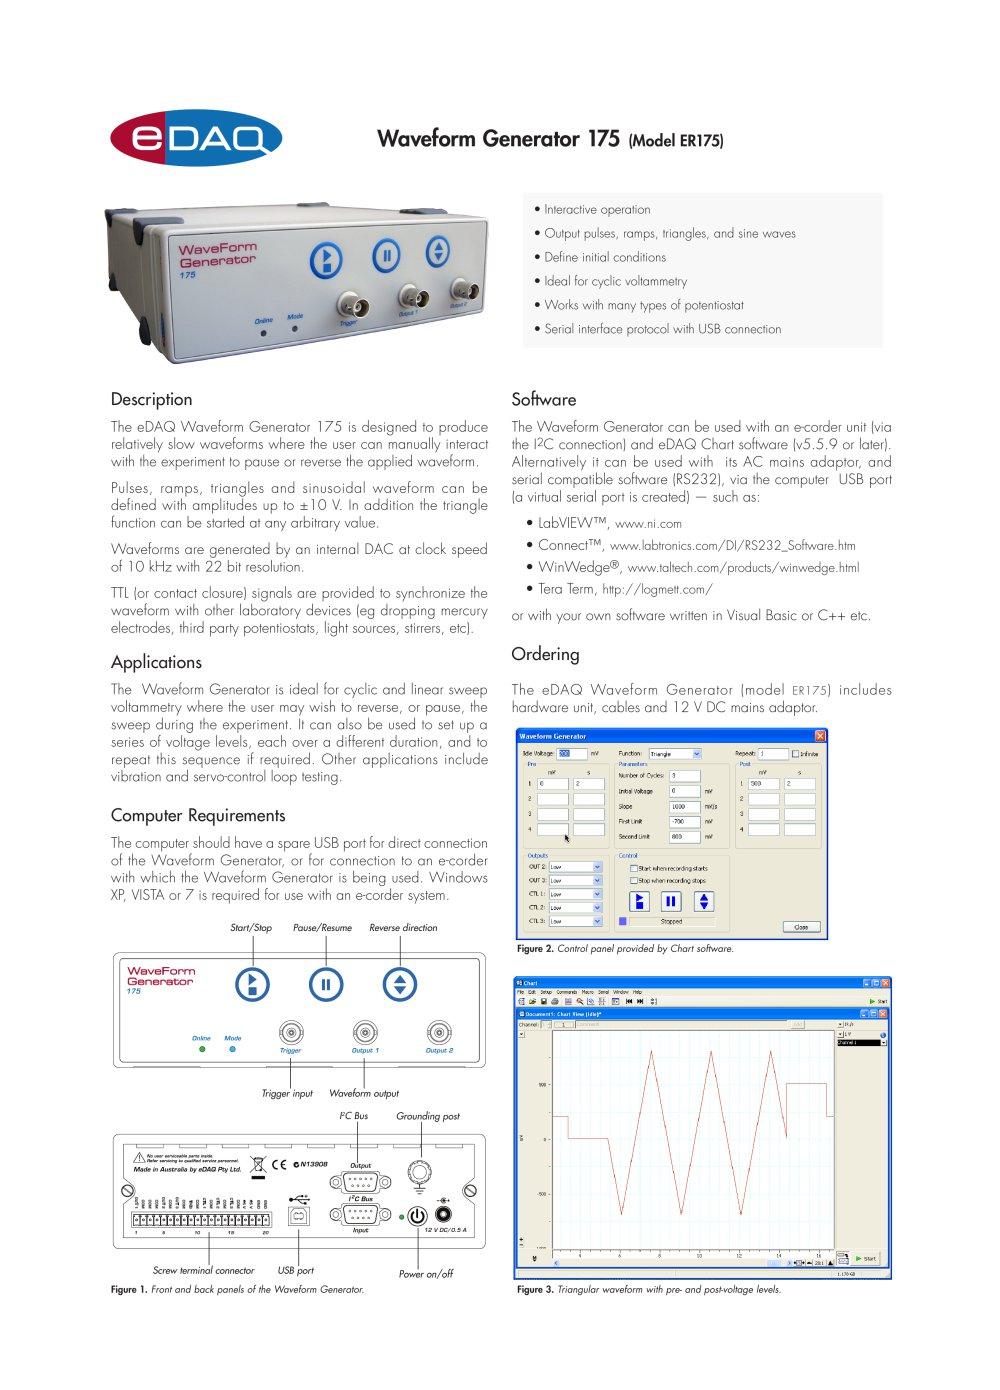 Er175 Waveform Generator Edaq Pdf Catalogue Technical Triangular Wave 1 4 Pages